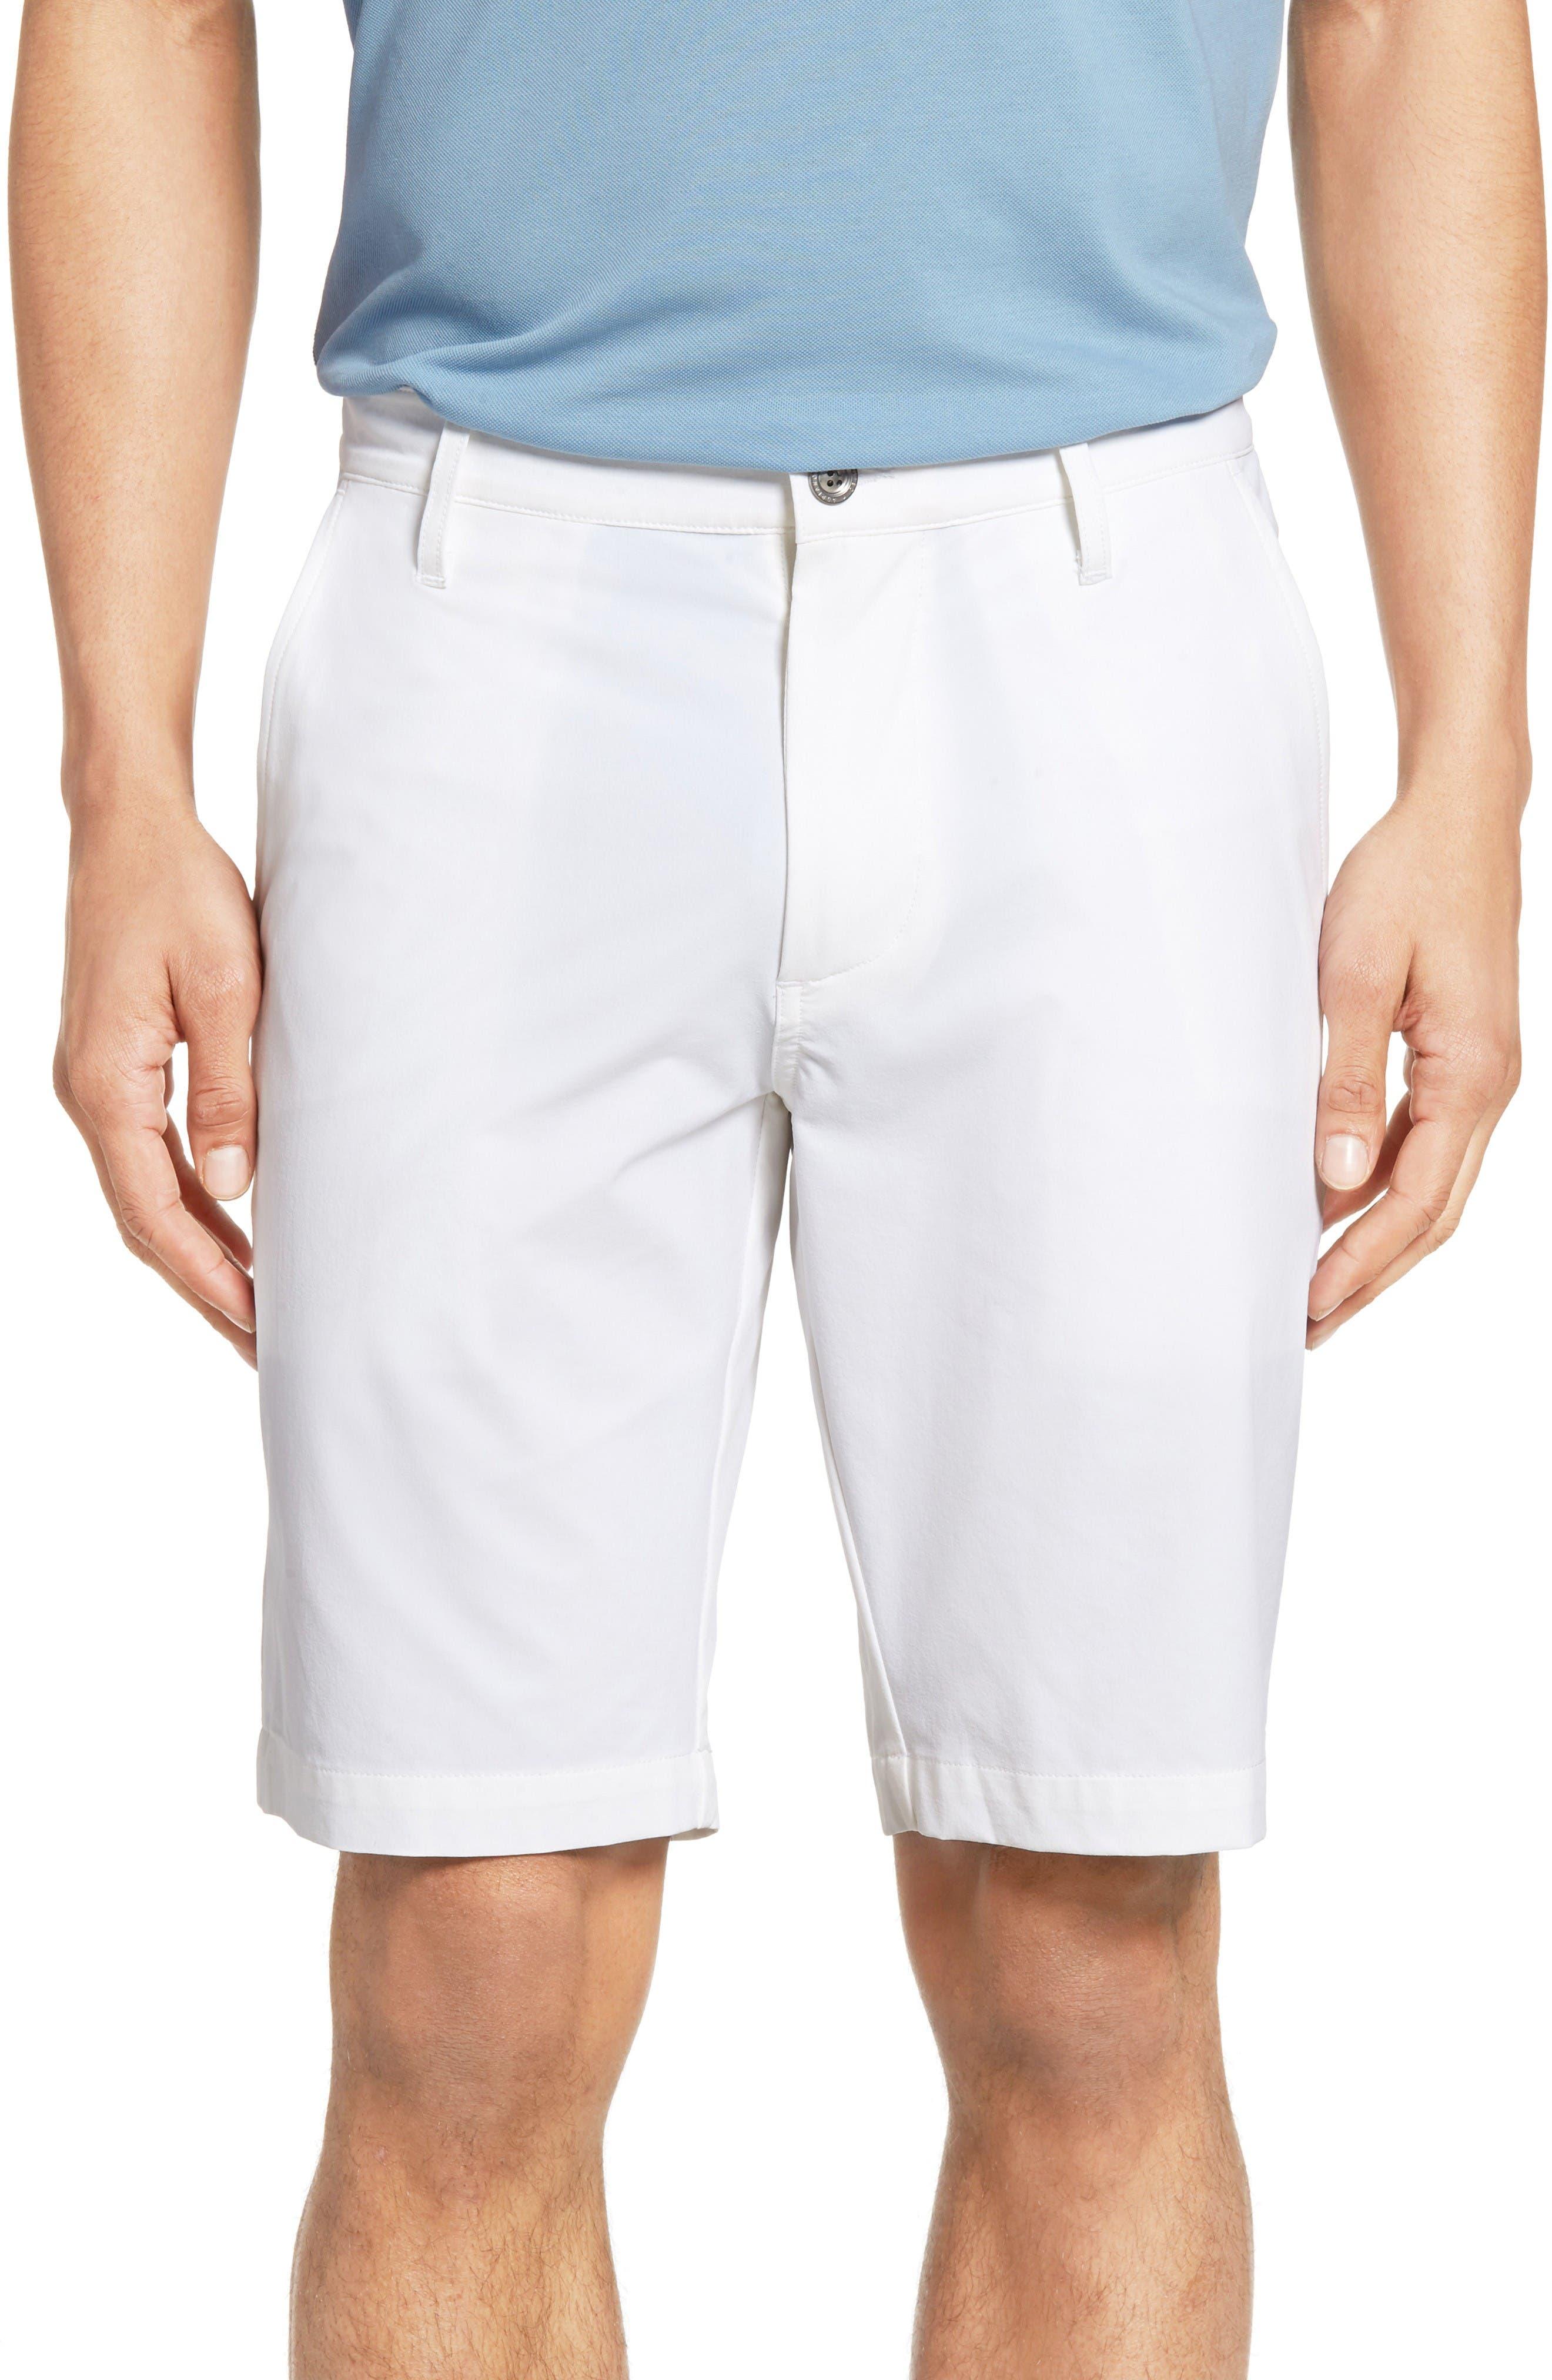 Canyon Shorts,                         Main,                         color, Bright White